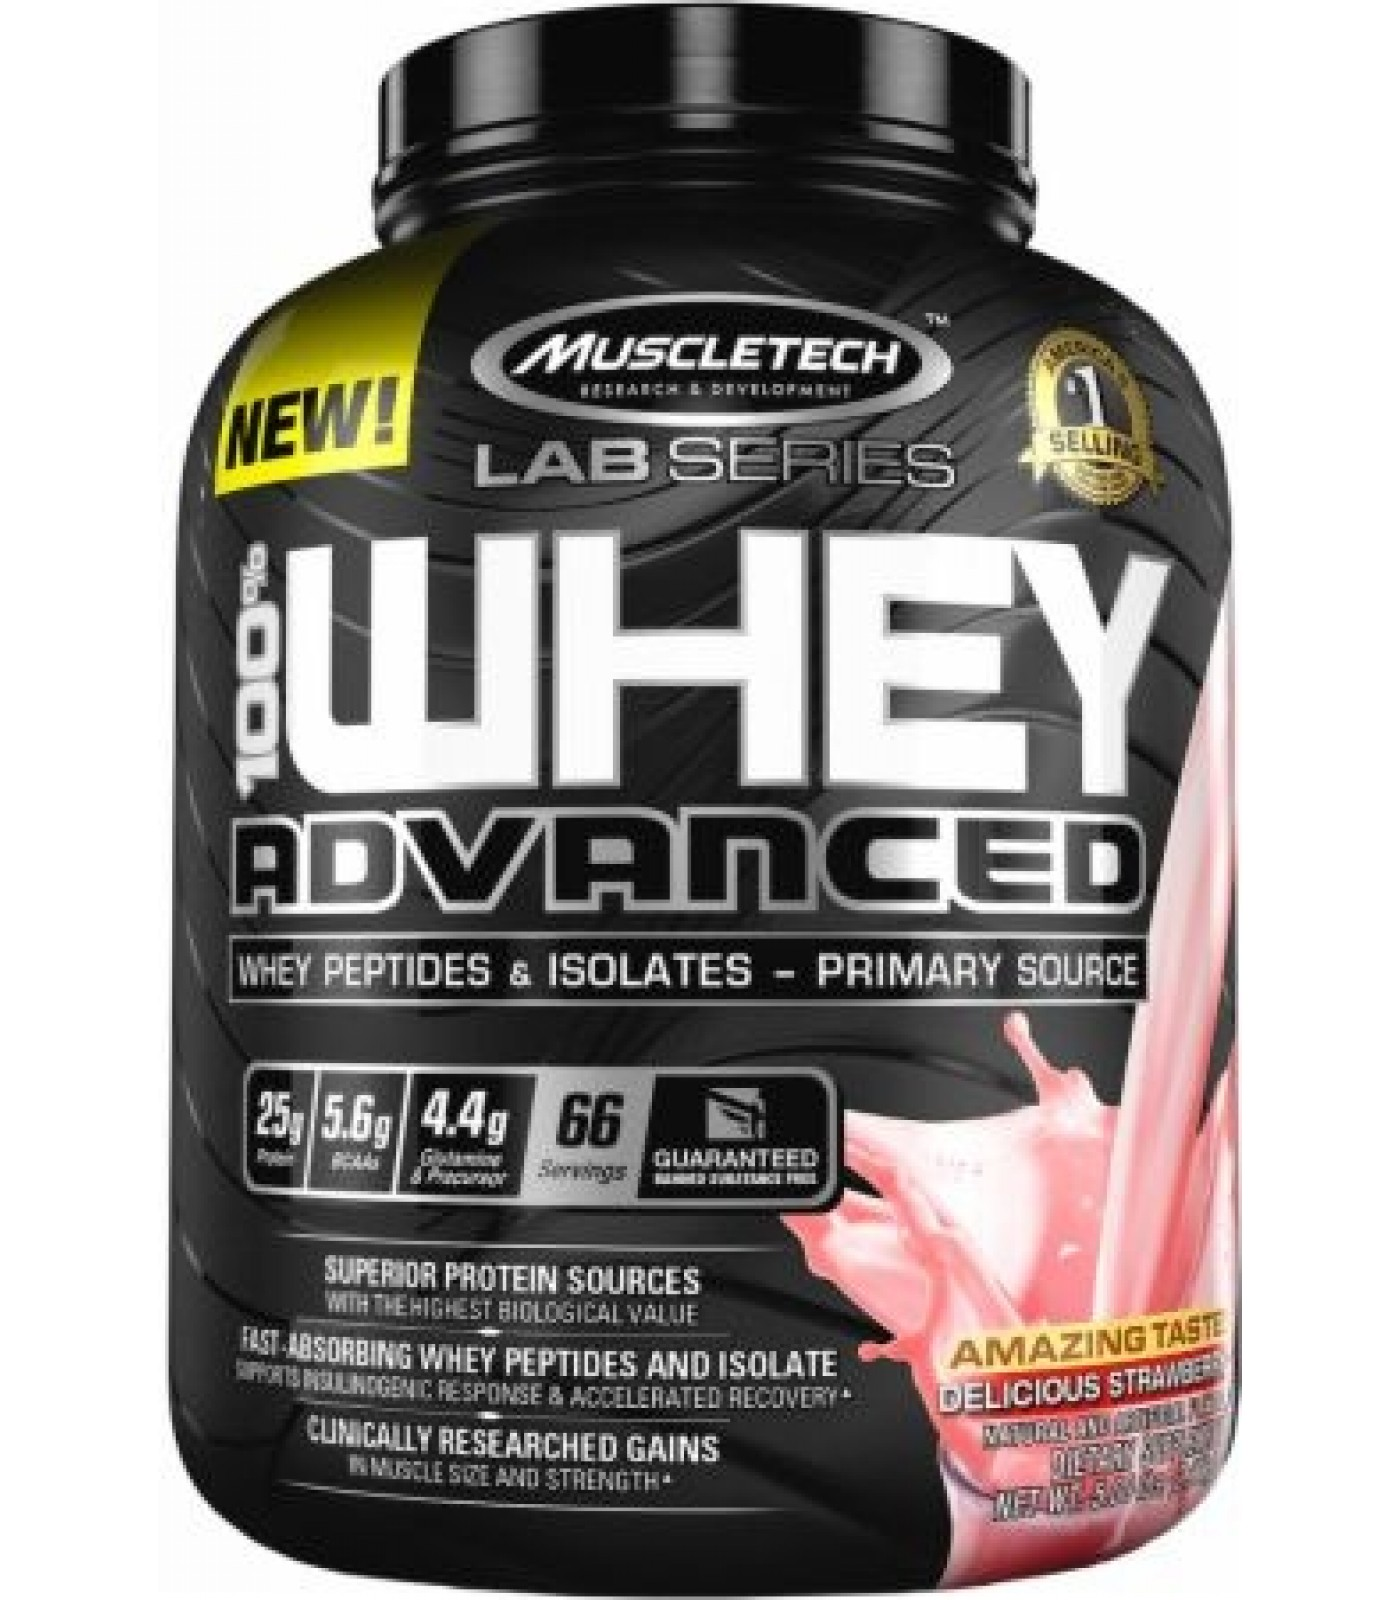 MuscleTech Lab Series - 100% Whey Advanced / 5lbs.